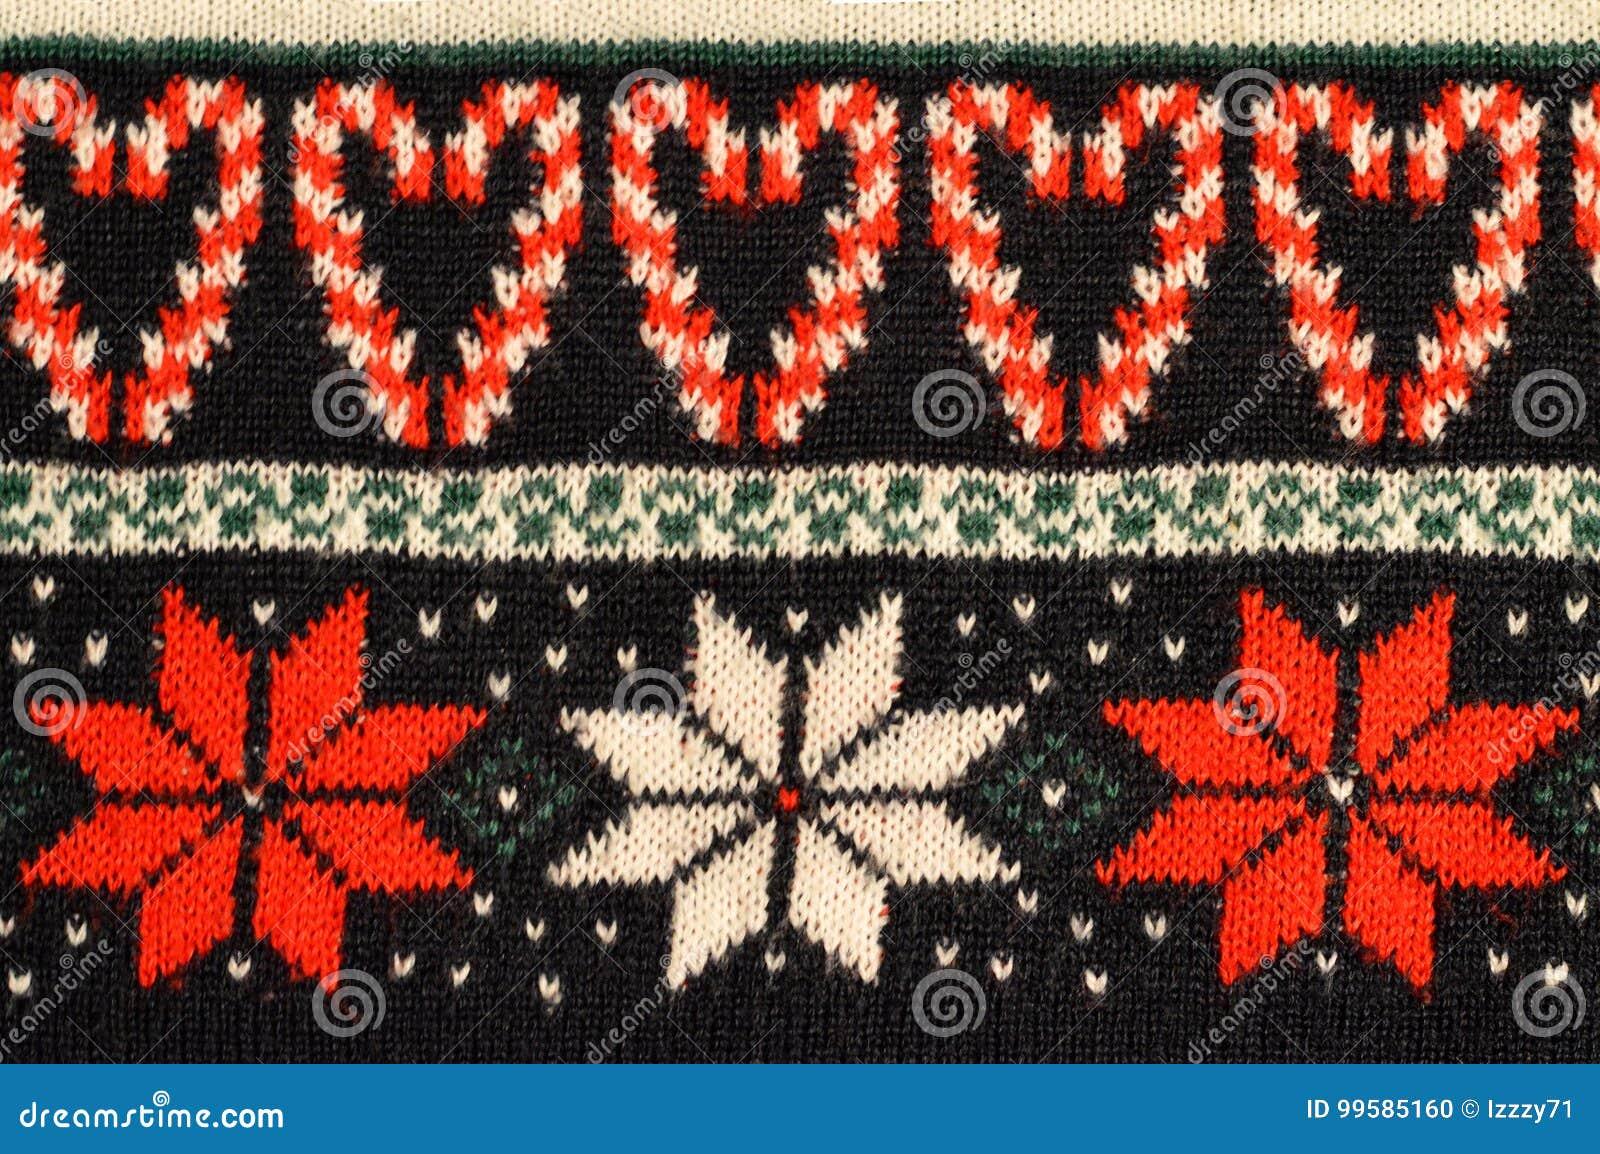 12e79b84b Christmas sweater design stock photo. Image of craft - 99585160